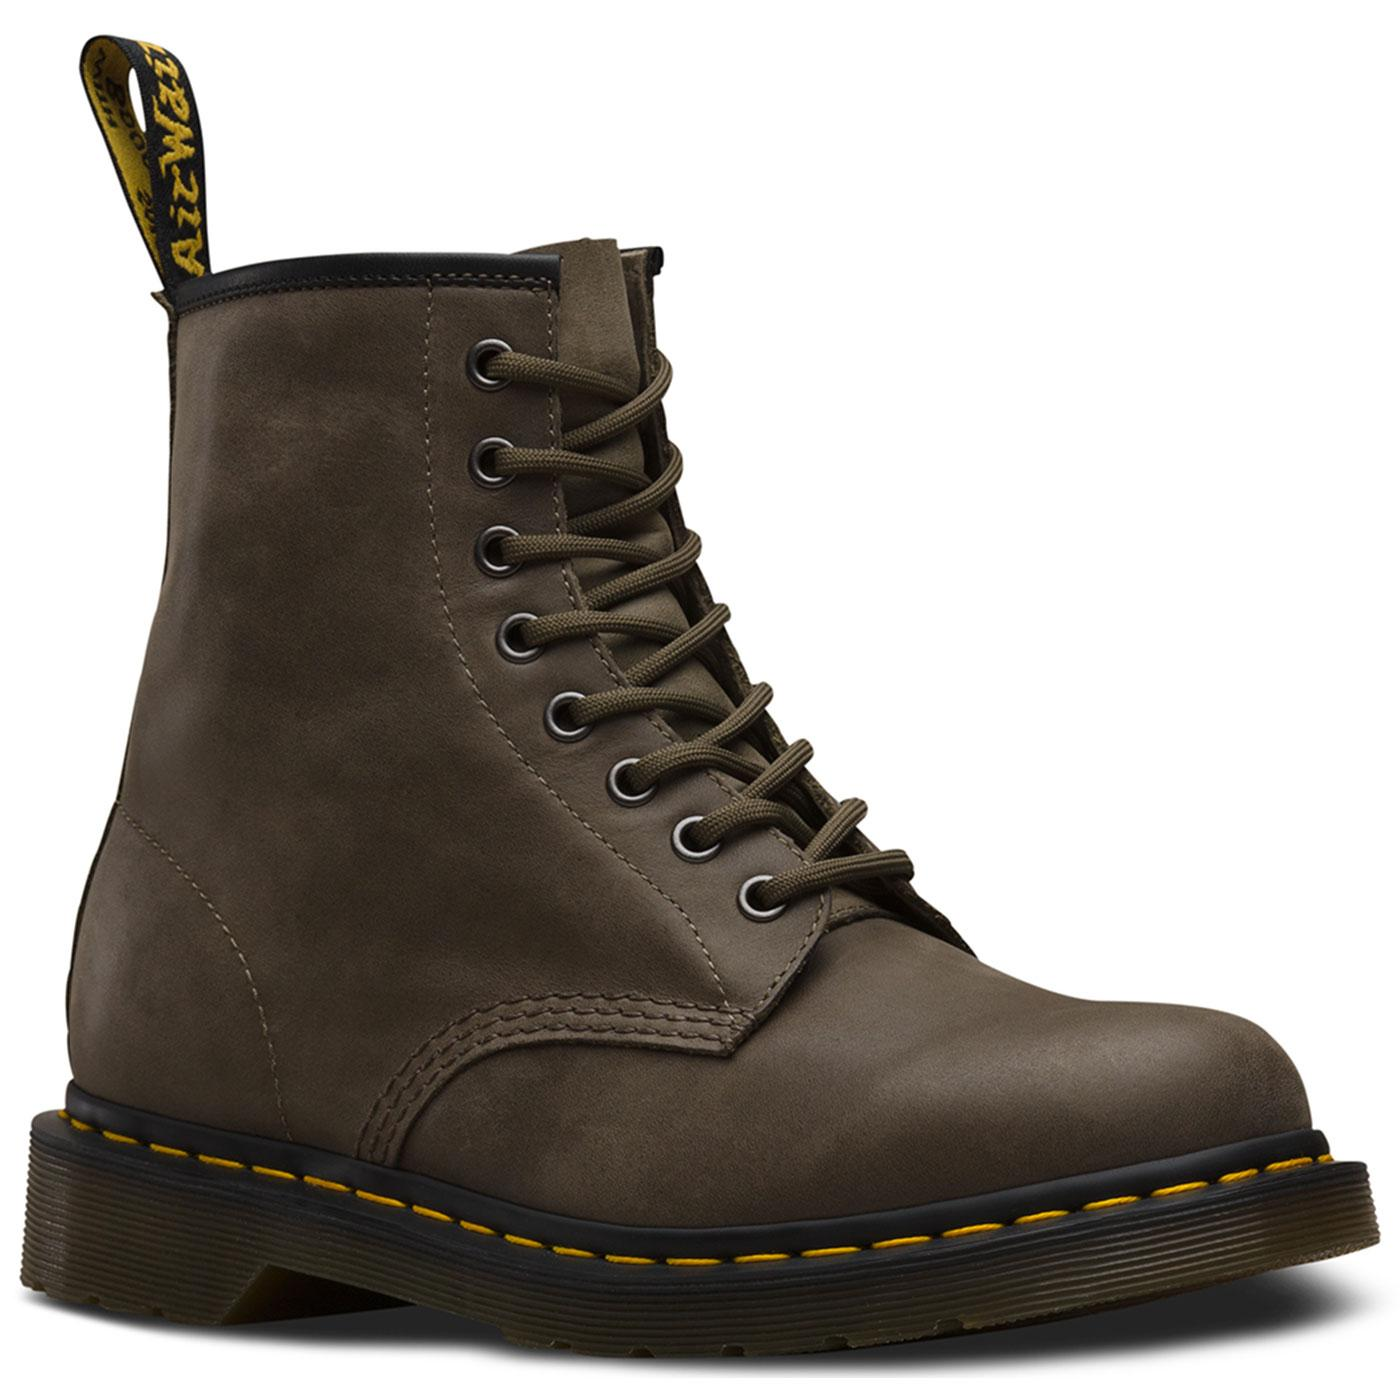 DR MARTENS Men's Retro 1460 Boots in Dusky Olive